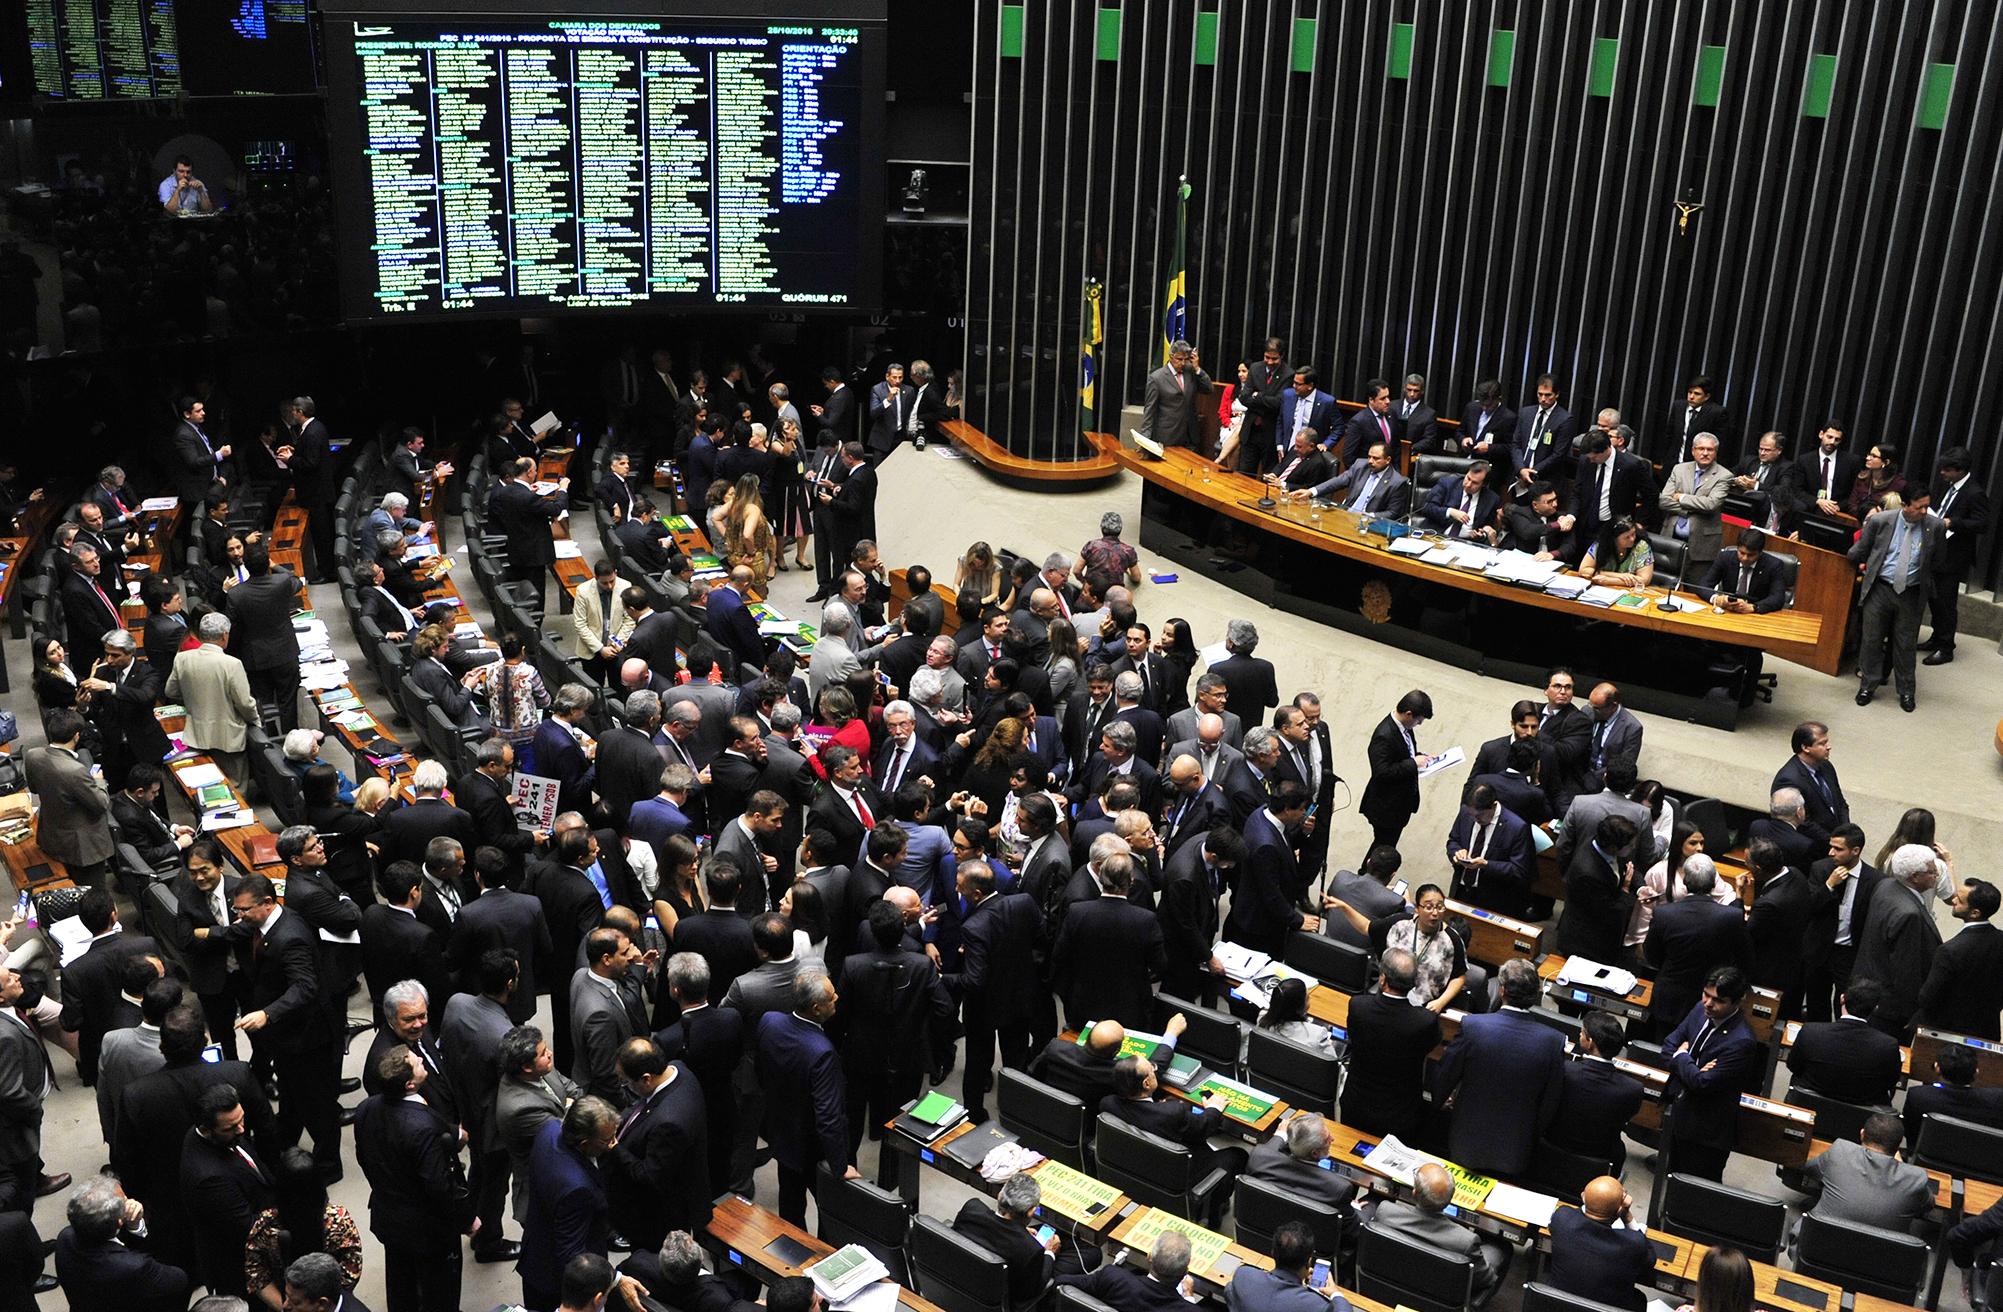 http://www.camara.leg.br/internet/bancoimagem/banco/img201610252129307737029.jpg